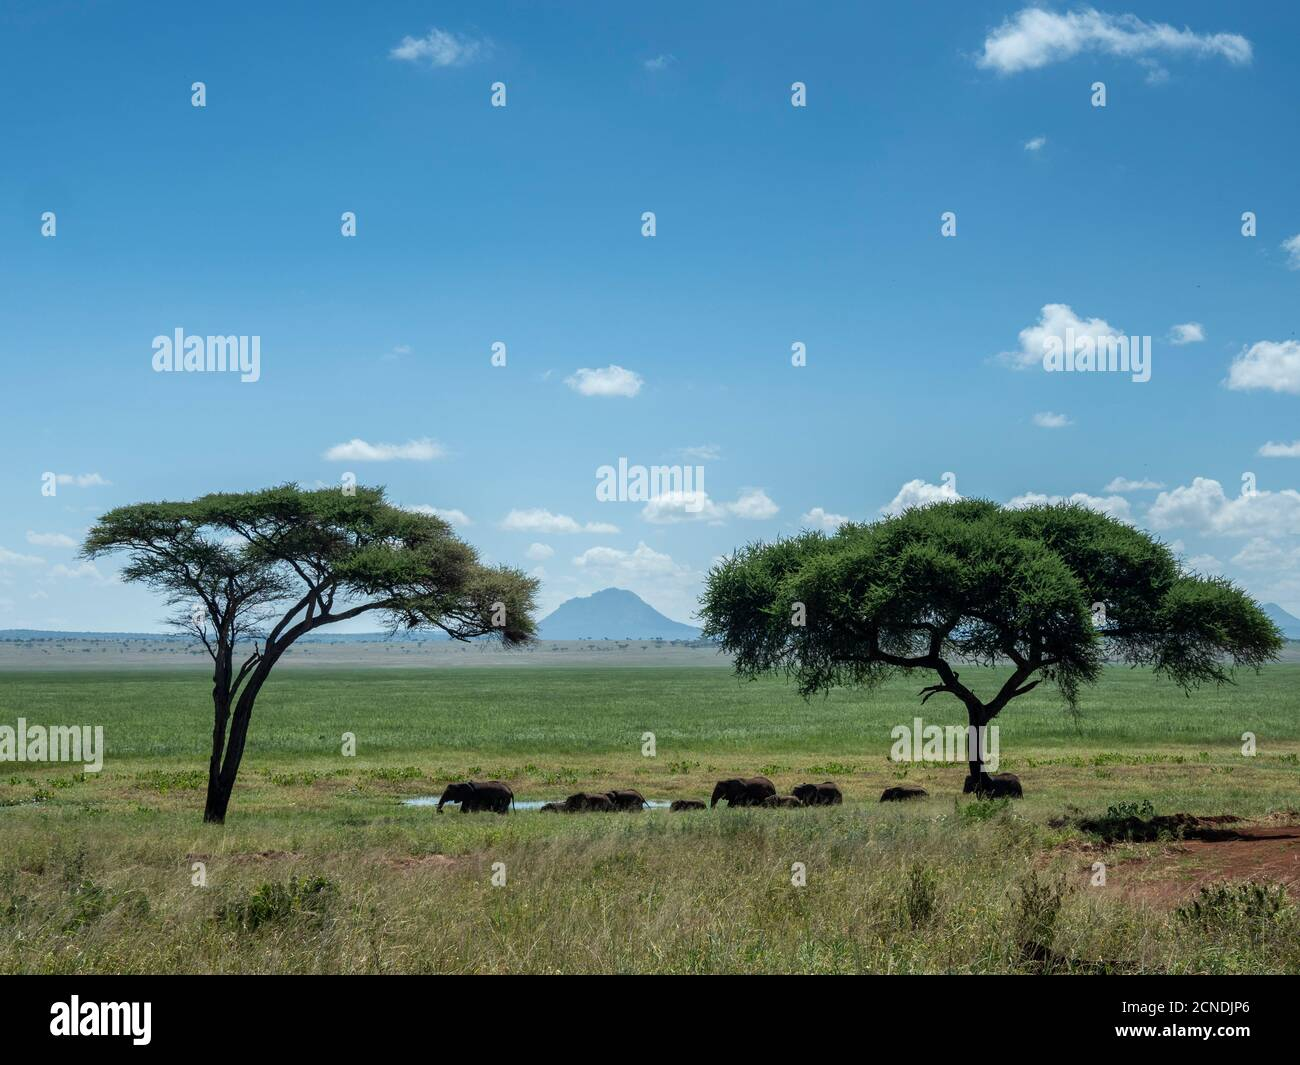 Una manada de elefantes de monte africanos (Loxodonta africana), Parque Nacional Tarangire, Tanzania, África Oriental, África Foto de stock